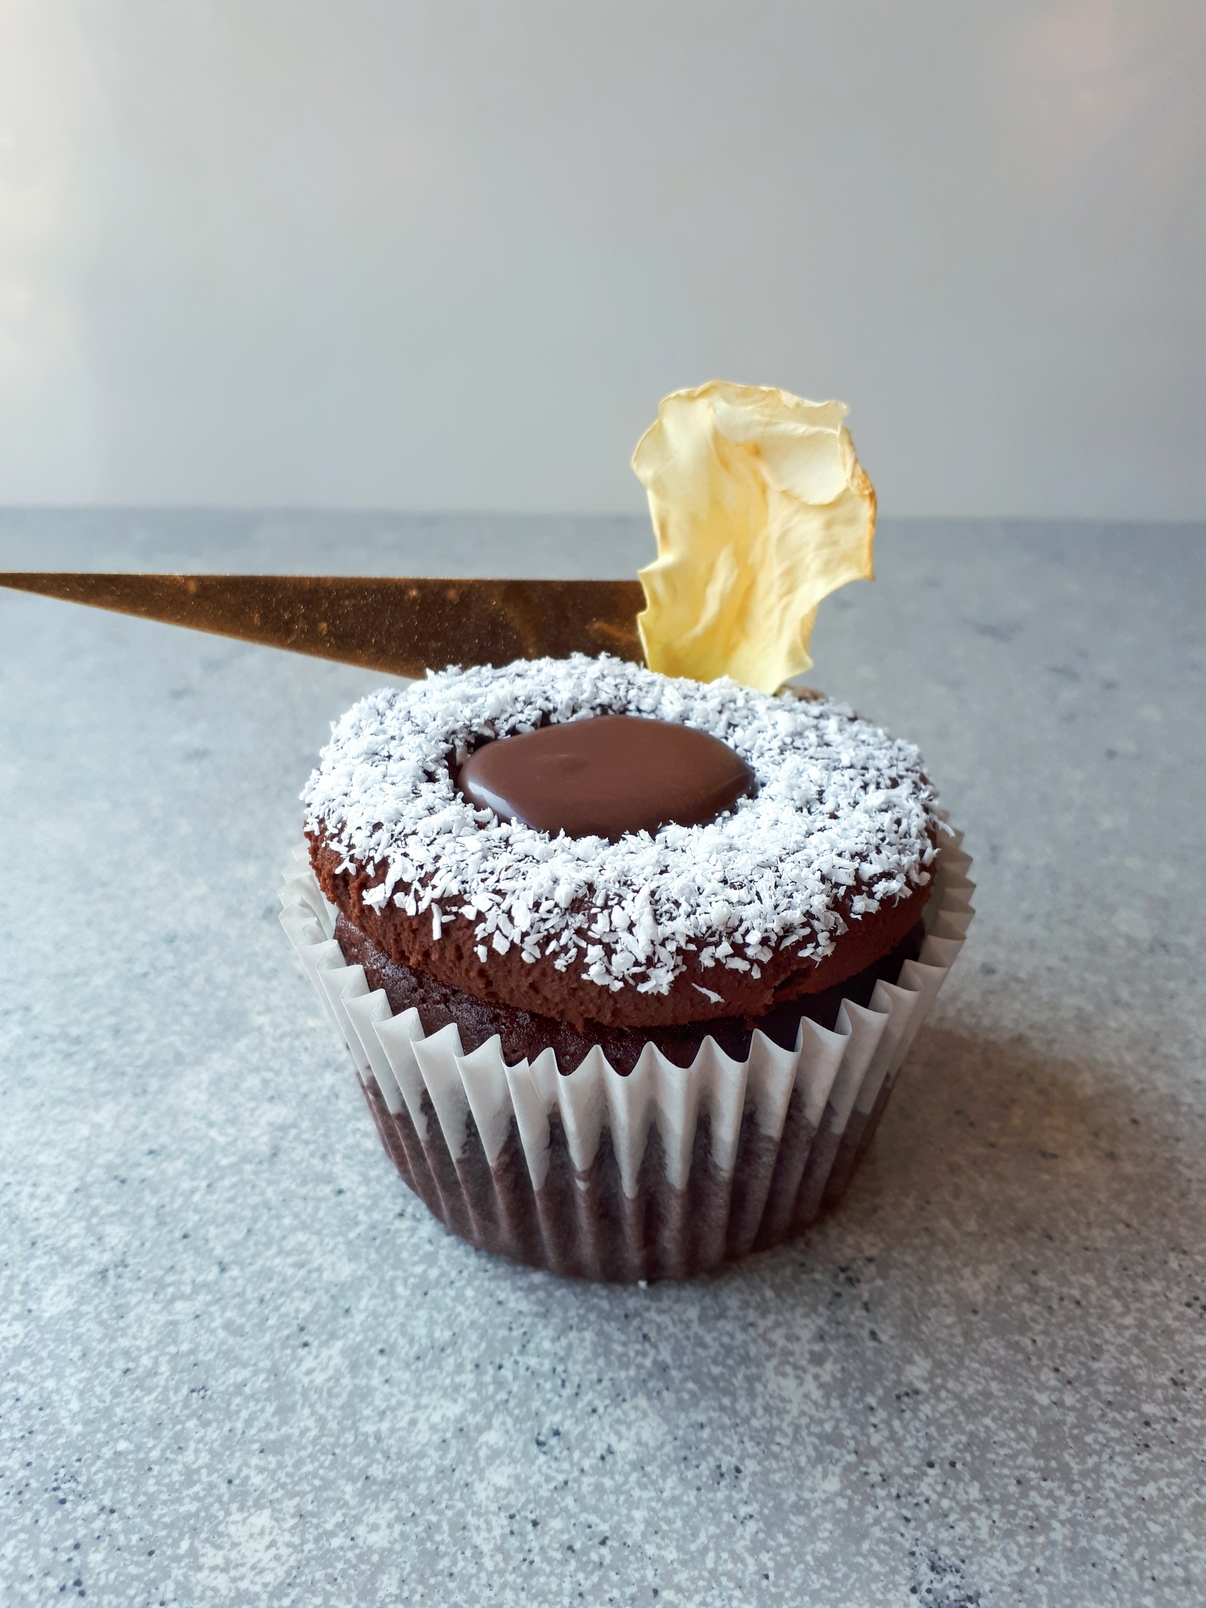 Dekadens trüffel cupcake